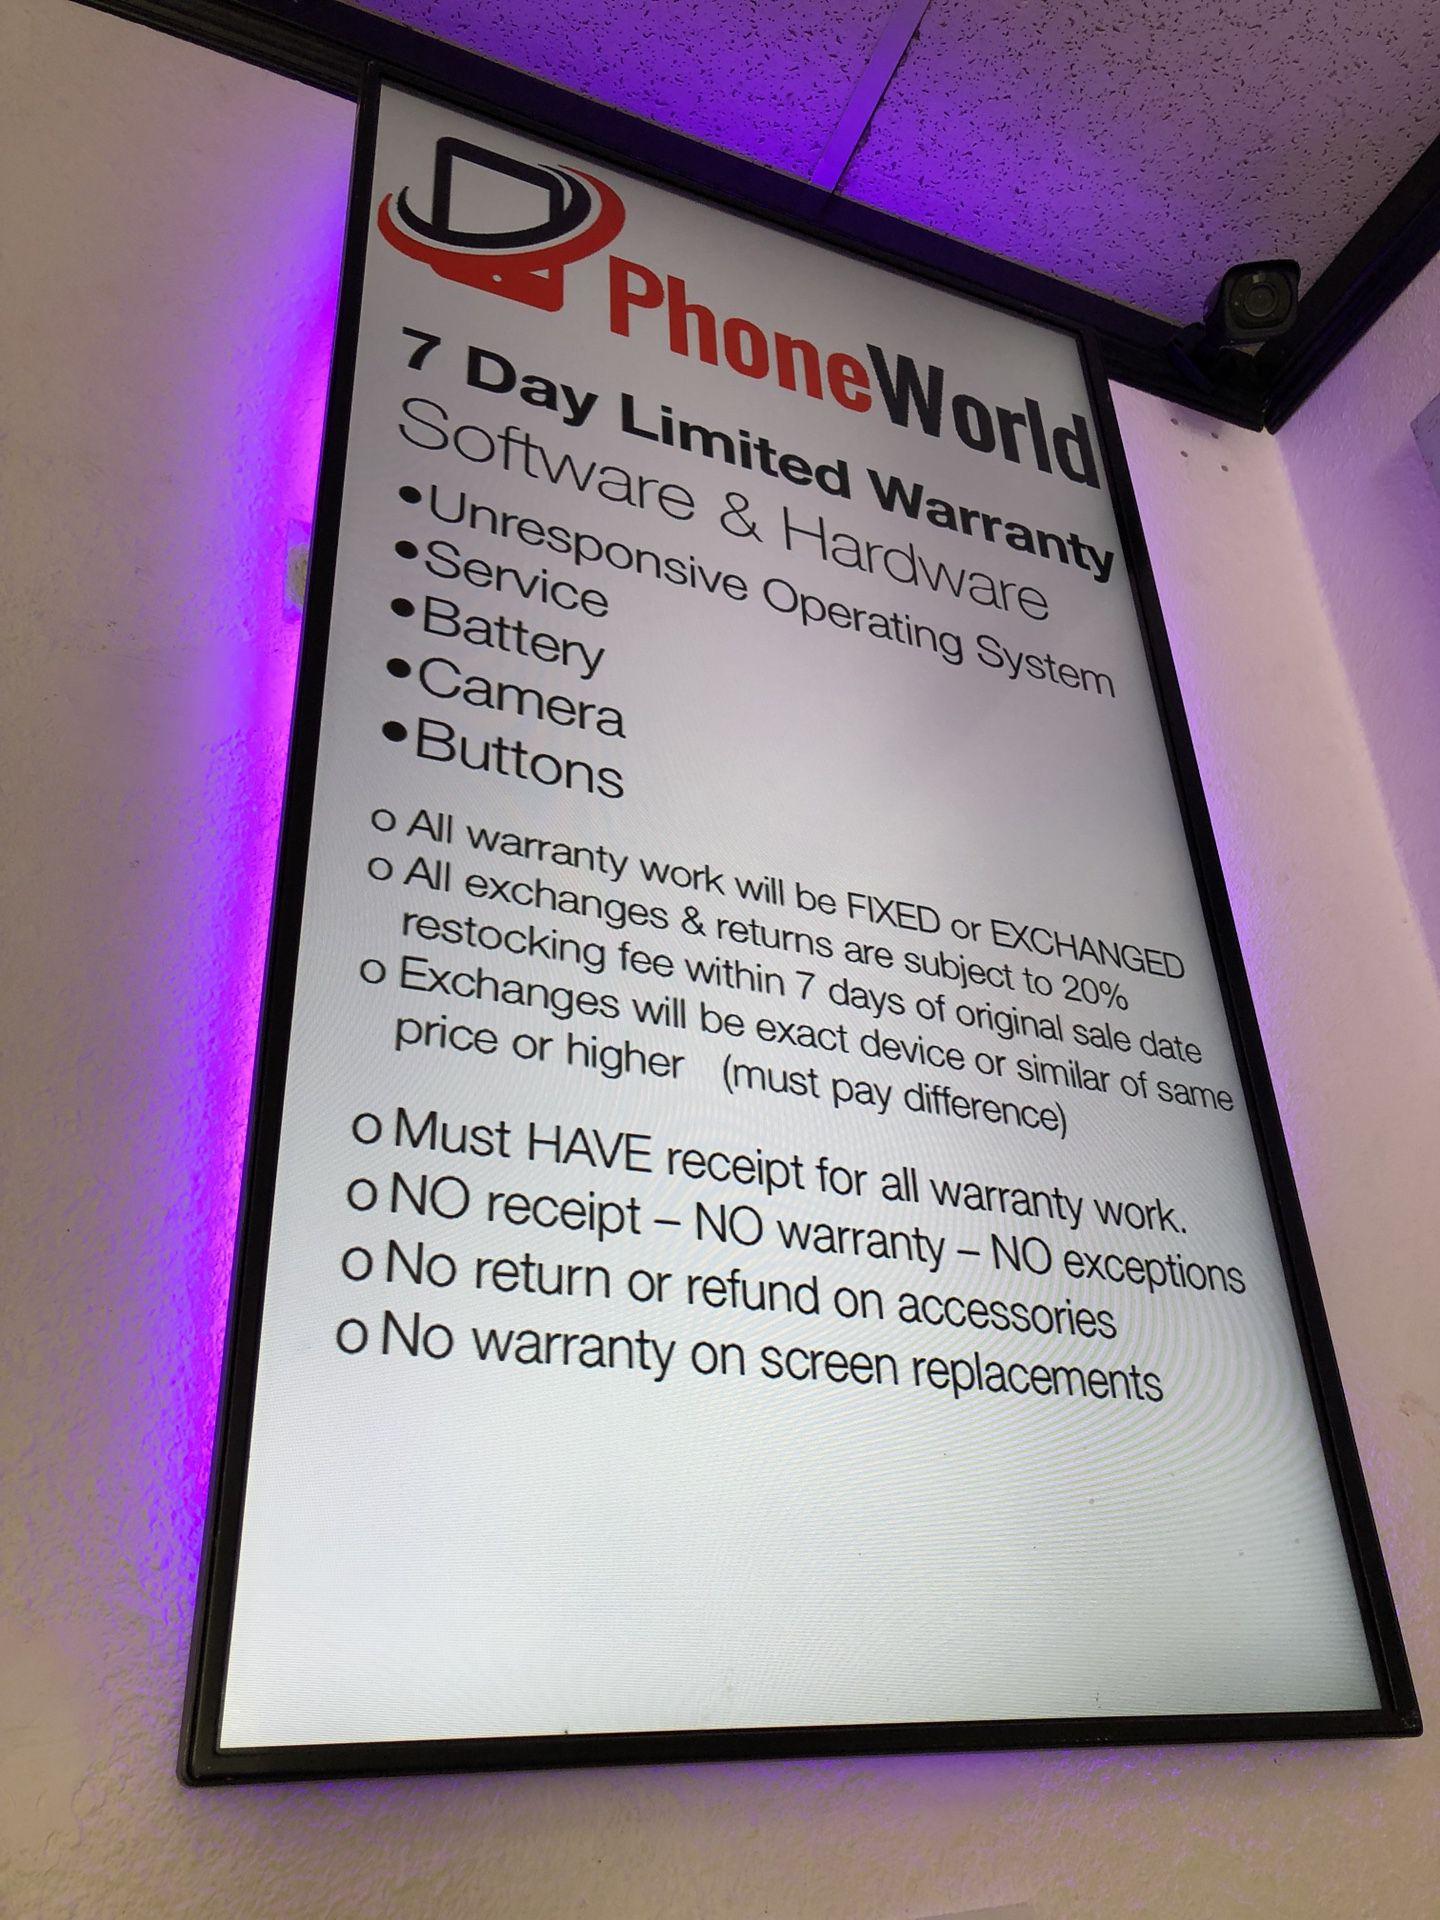 Free accessories at phoneworld Sahara! 🎁💰✅👌